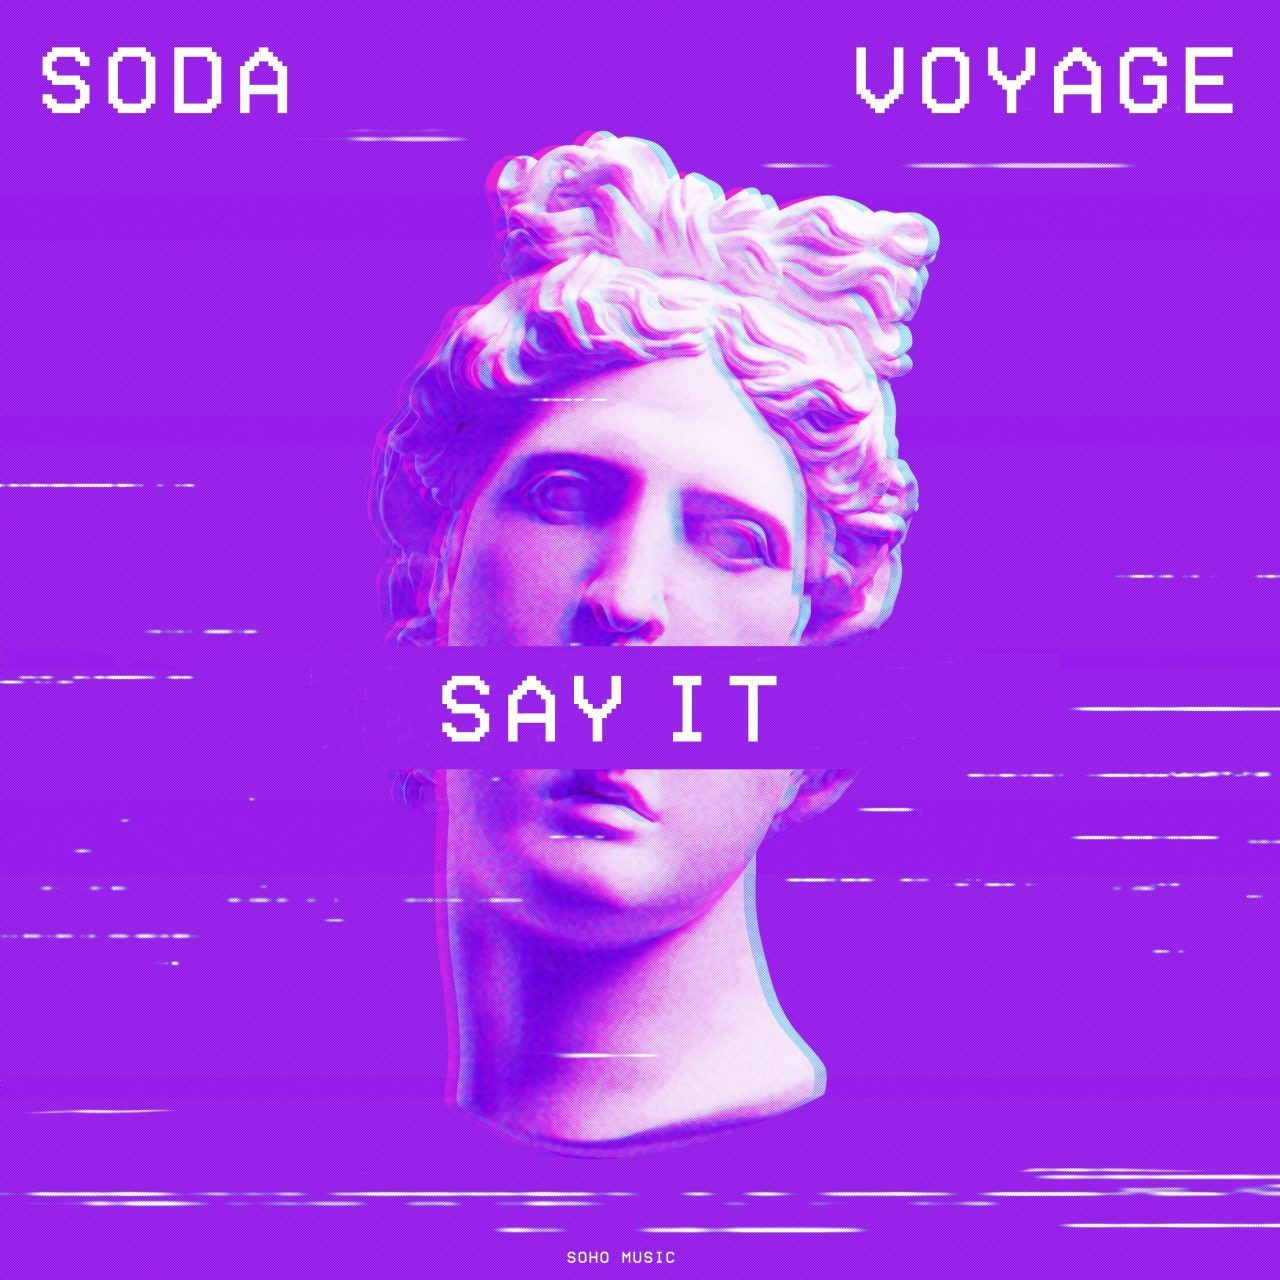 Soda x Voyage - Say It